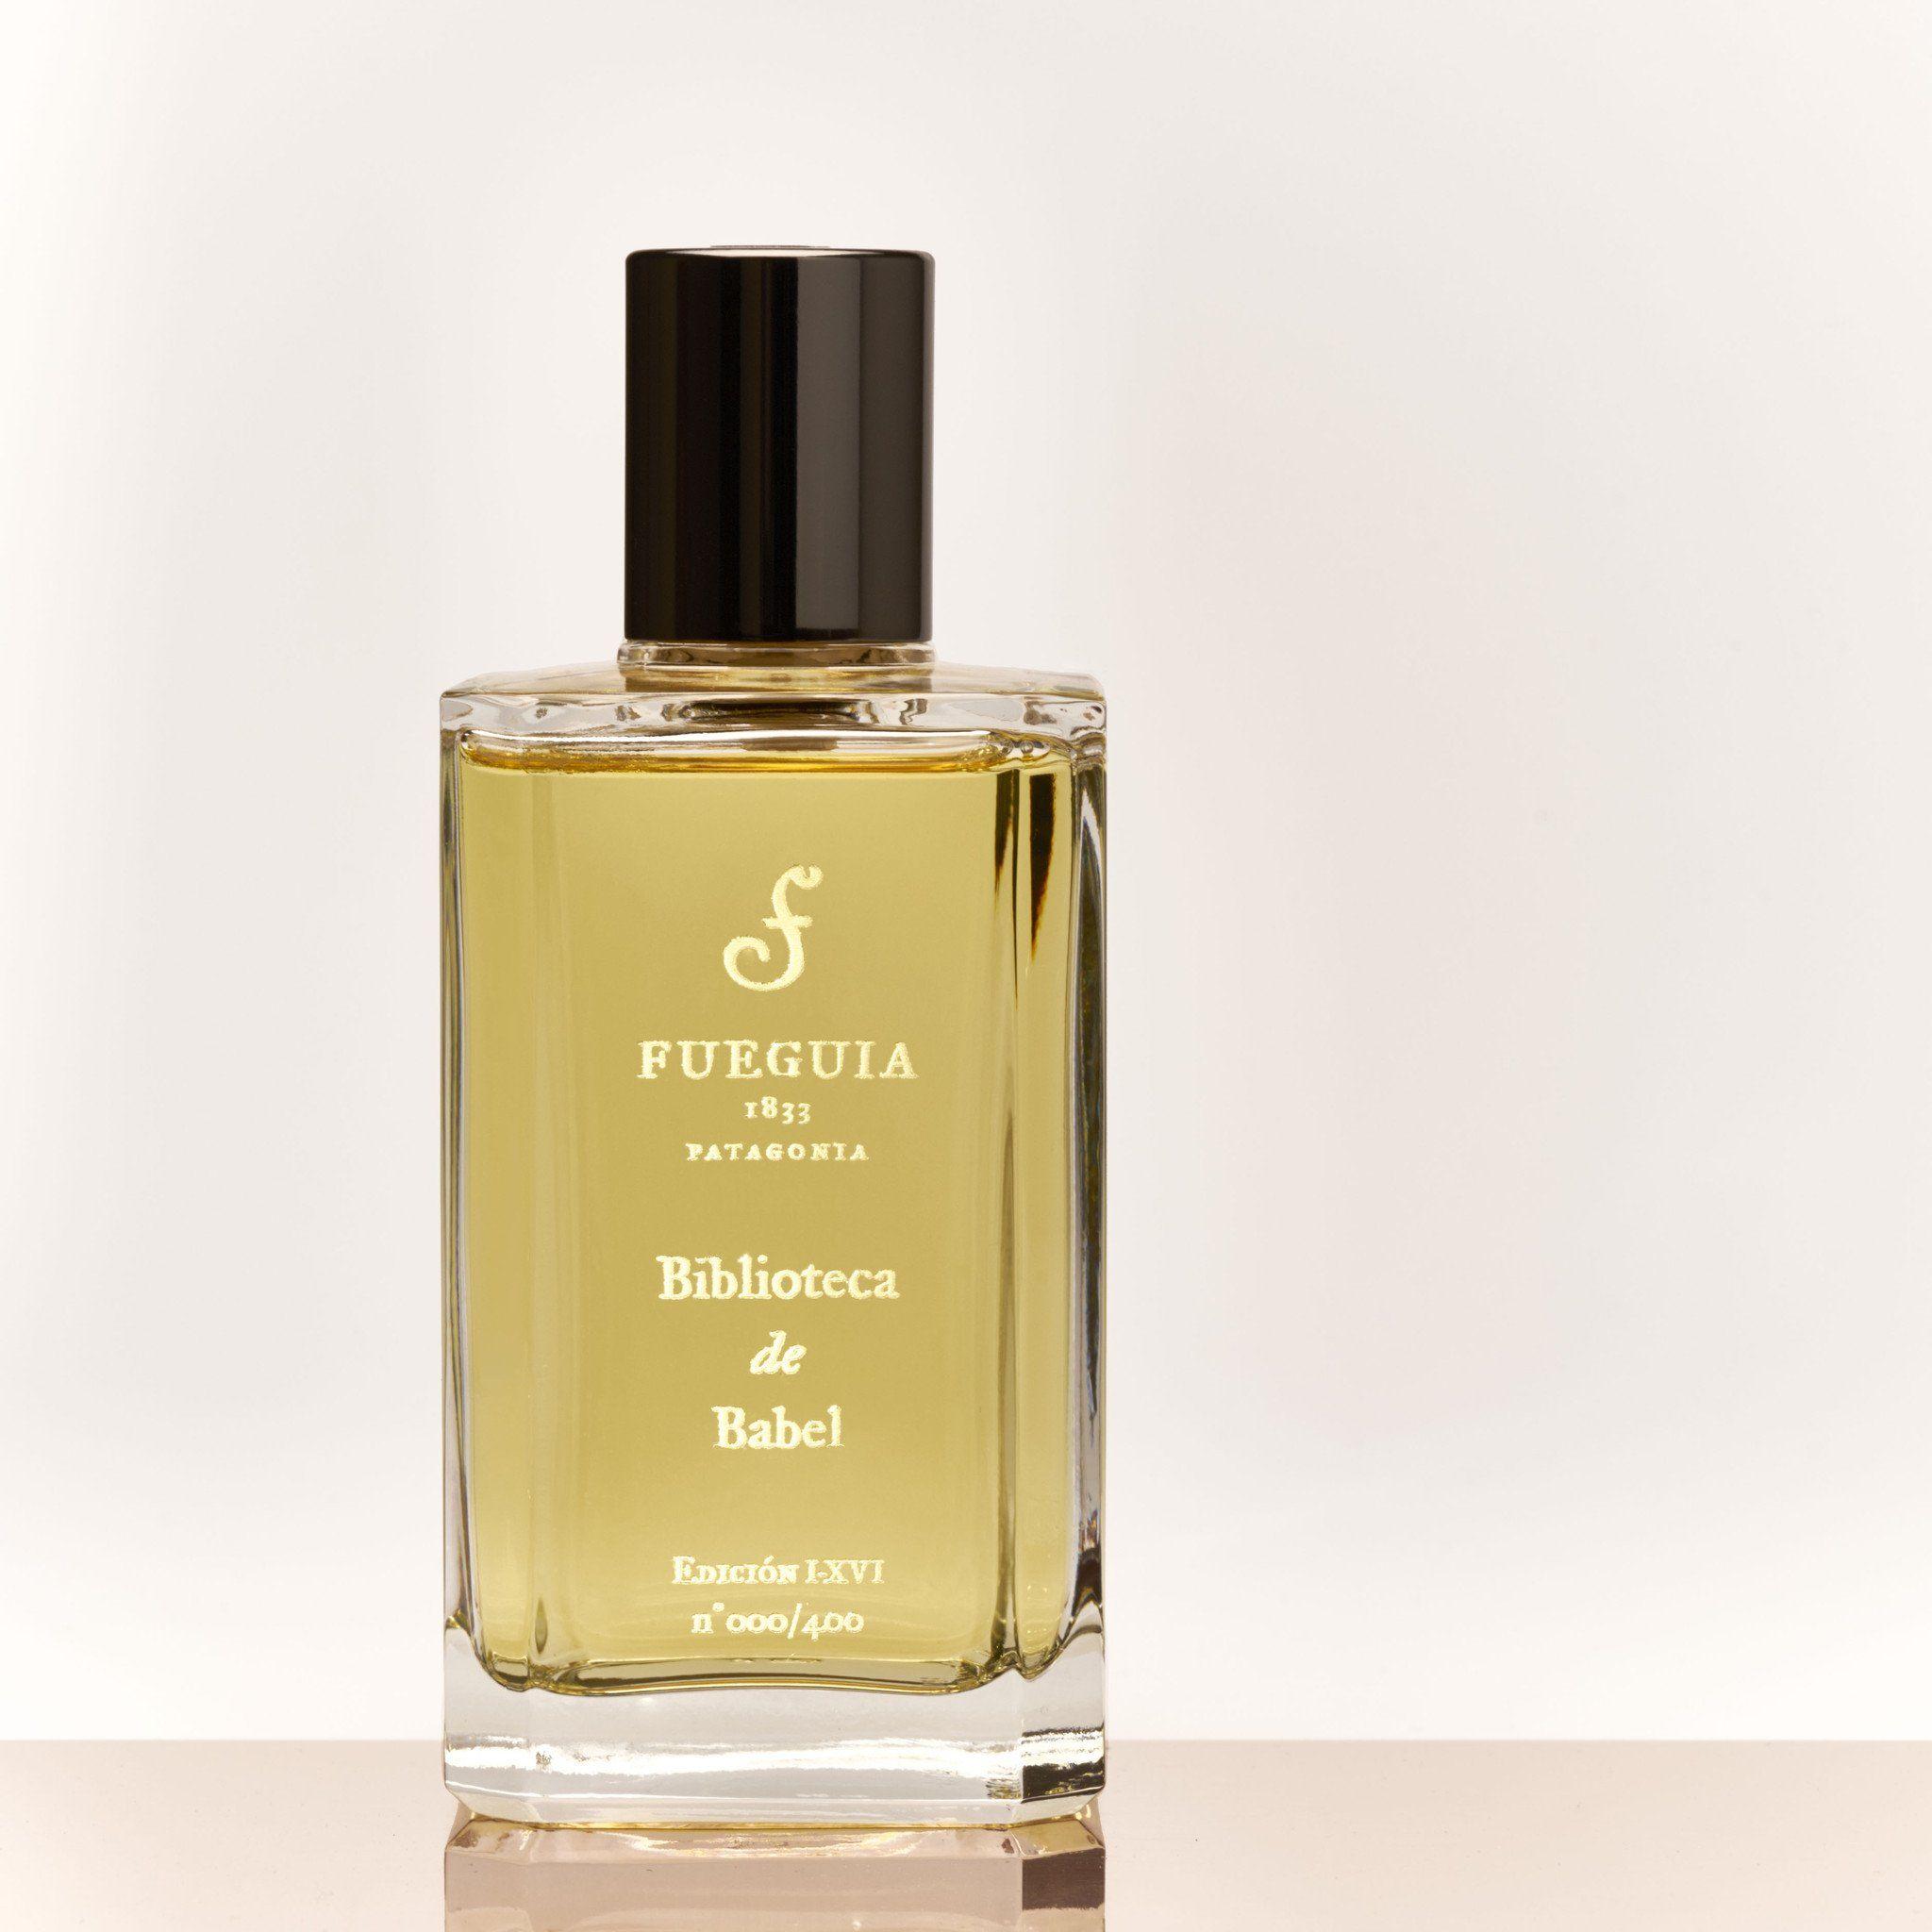 Biblioteca De Babel Perfume Pinterest Hermes 24 Faubourg Women Edt100 Ml Fueguia 1833